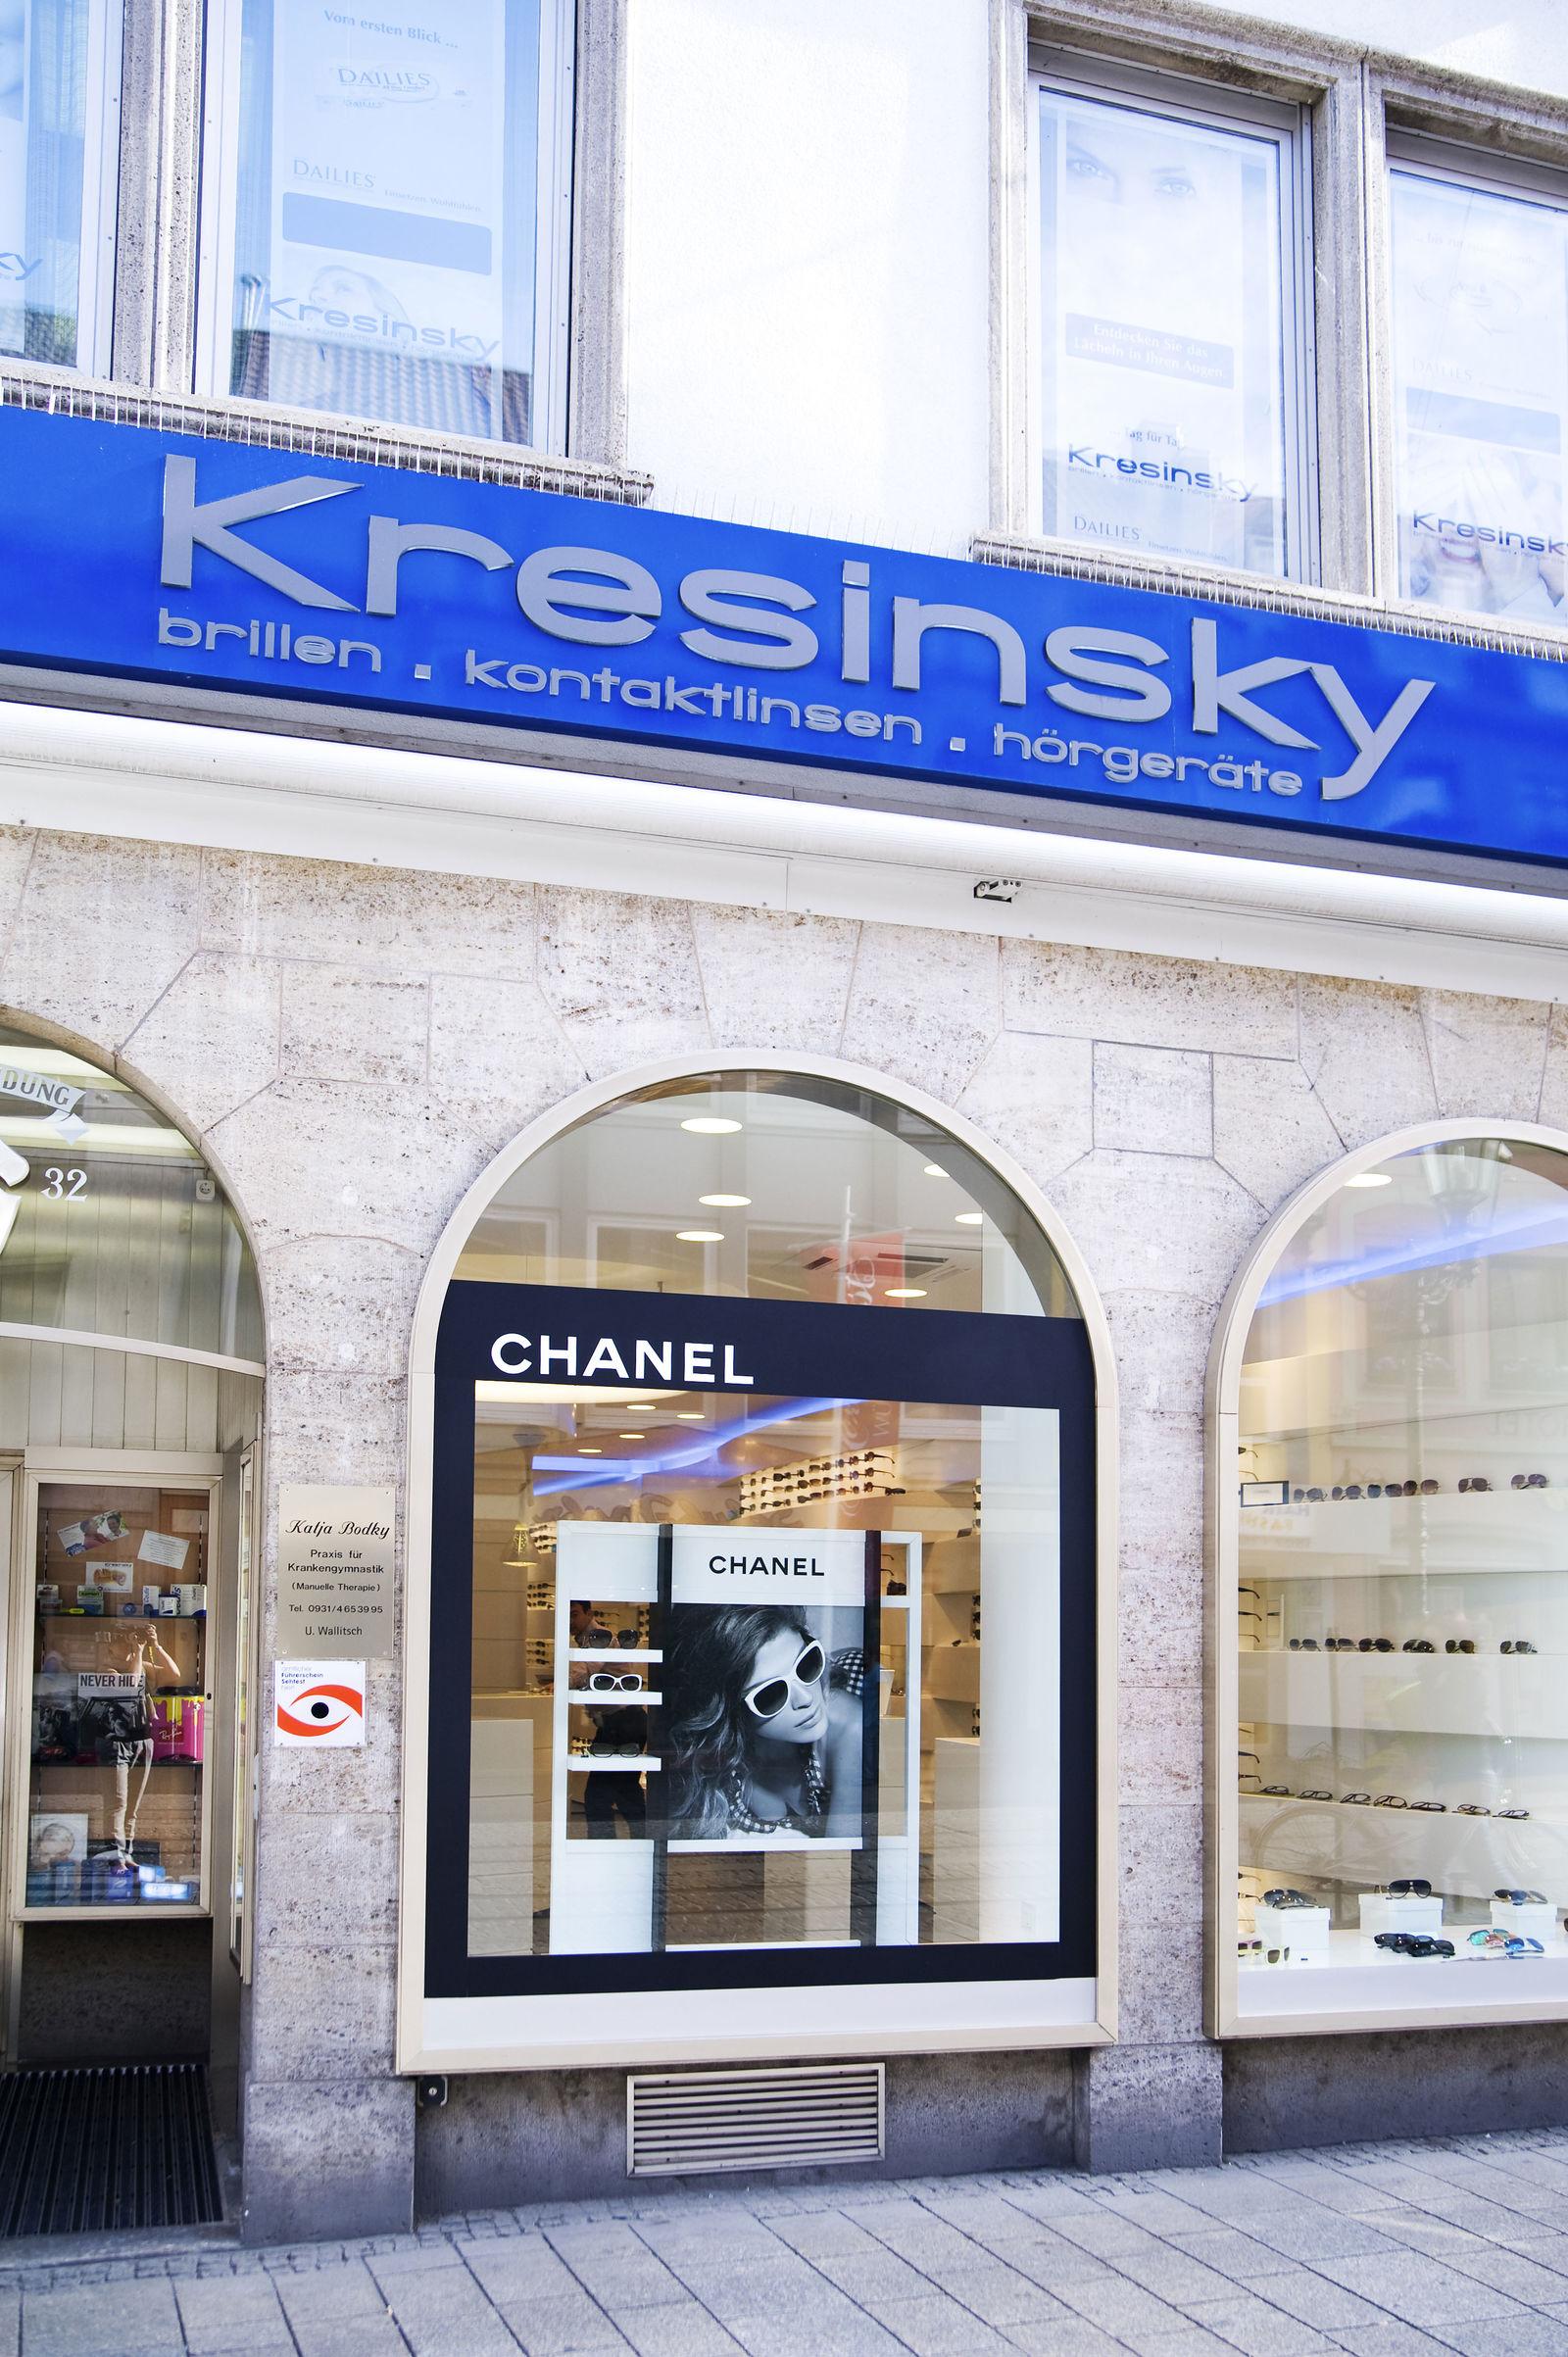 Kresinsky - brillen.kontaktlinsen.hörgeräte in Würzburg (Bild 6)